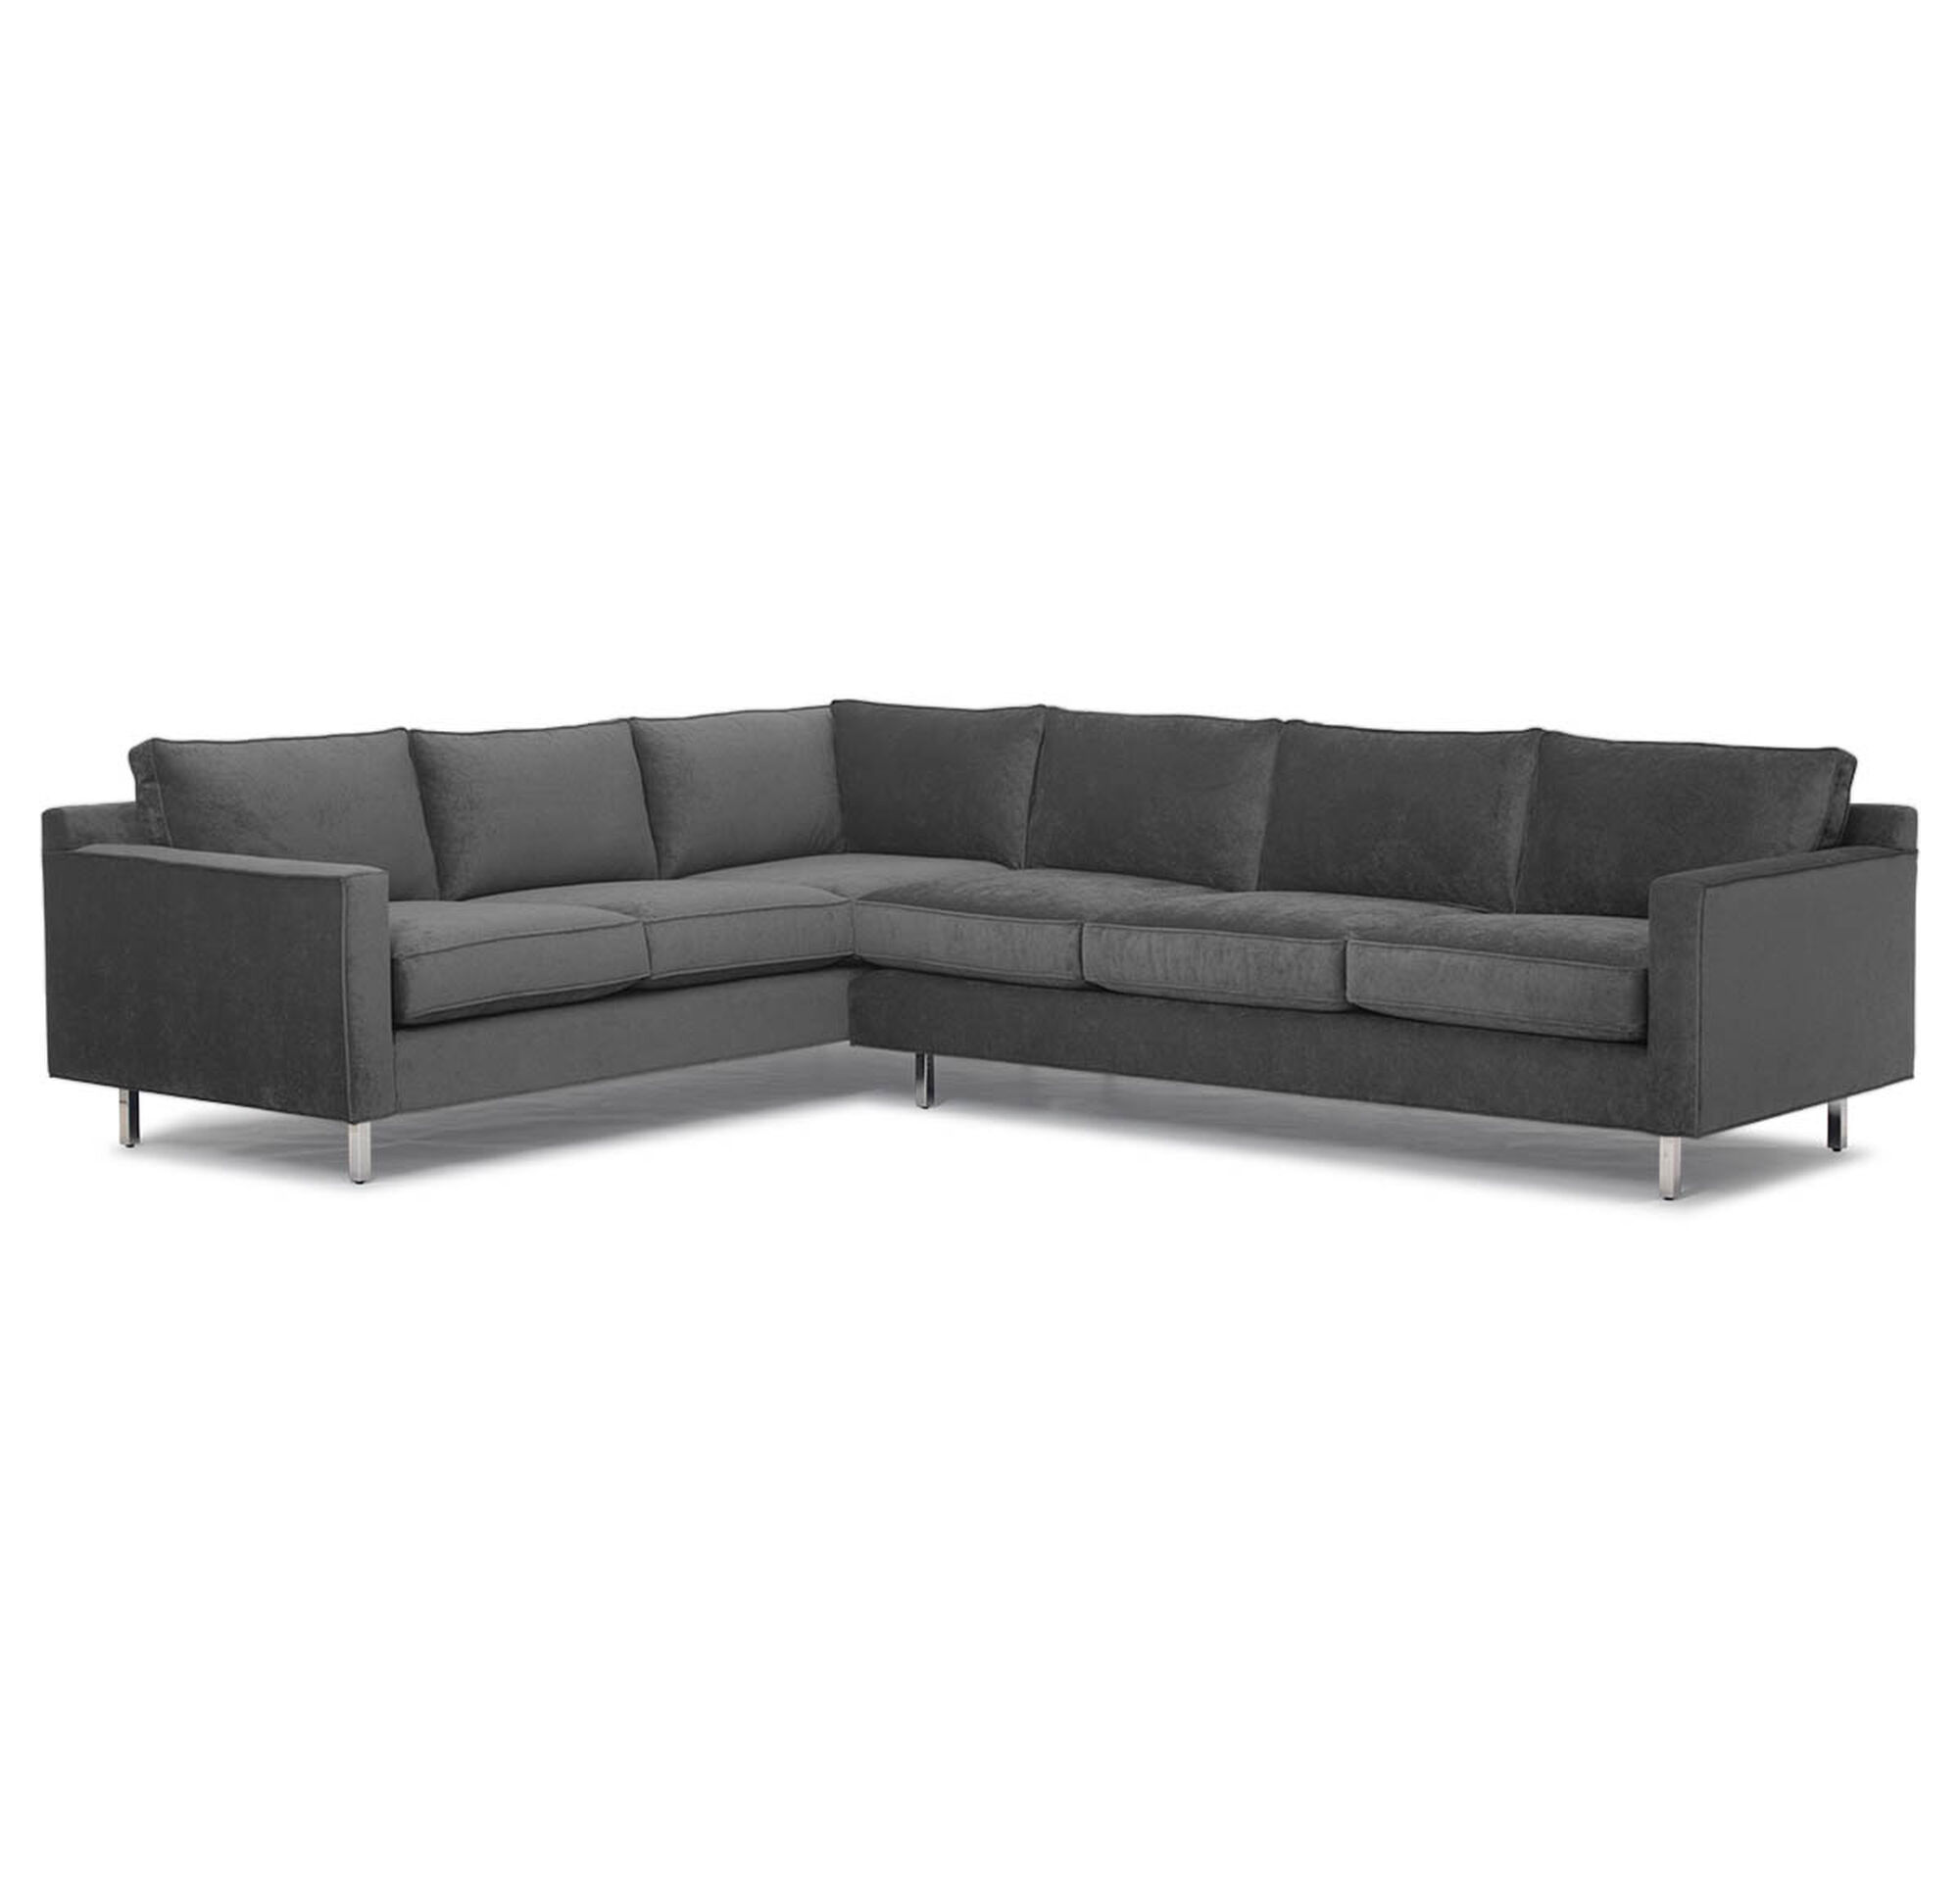 Hunter studio sectional sofa hi res